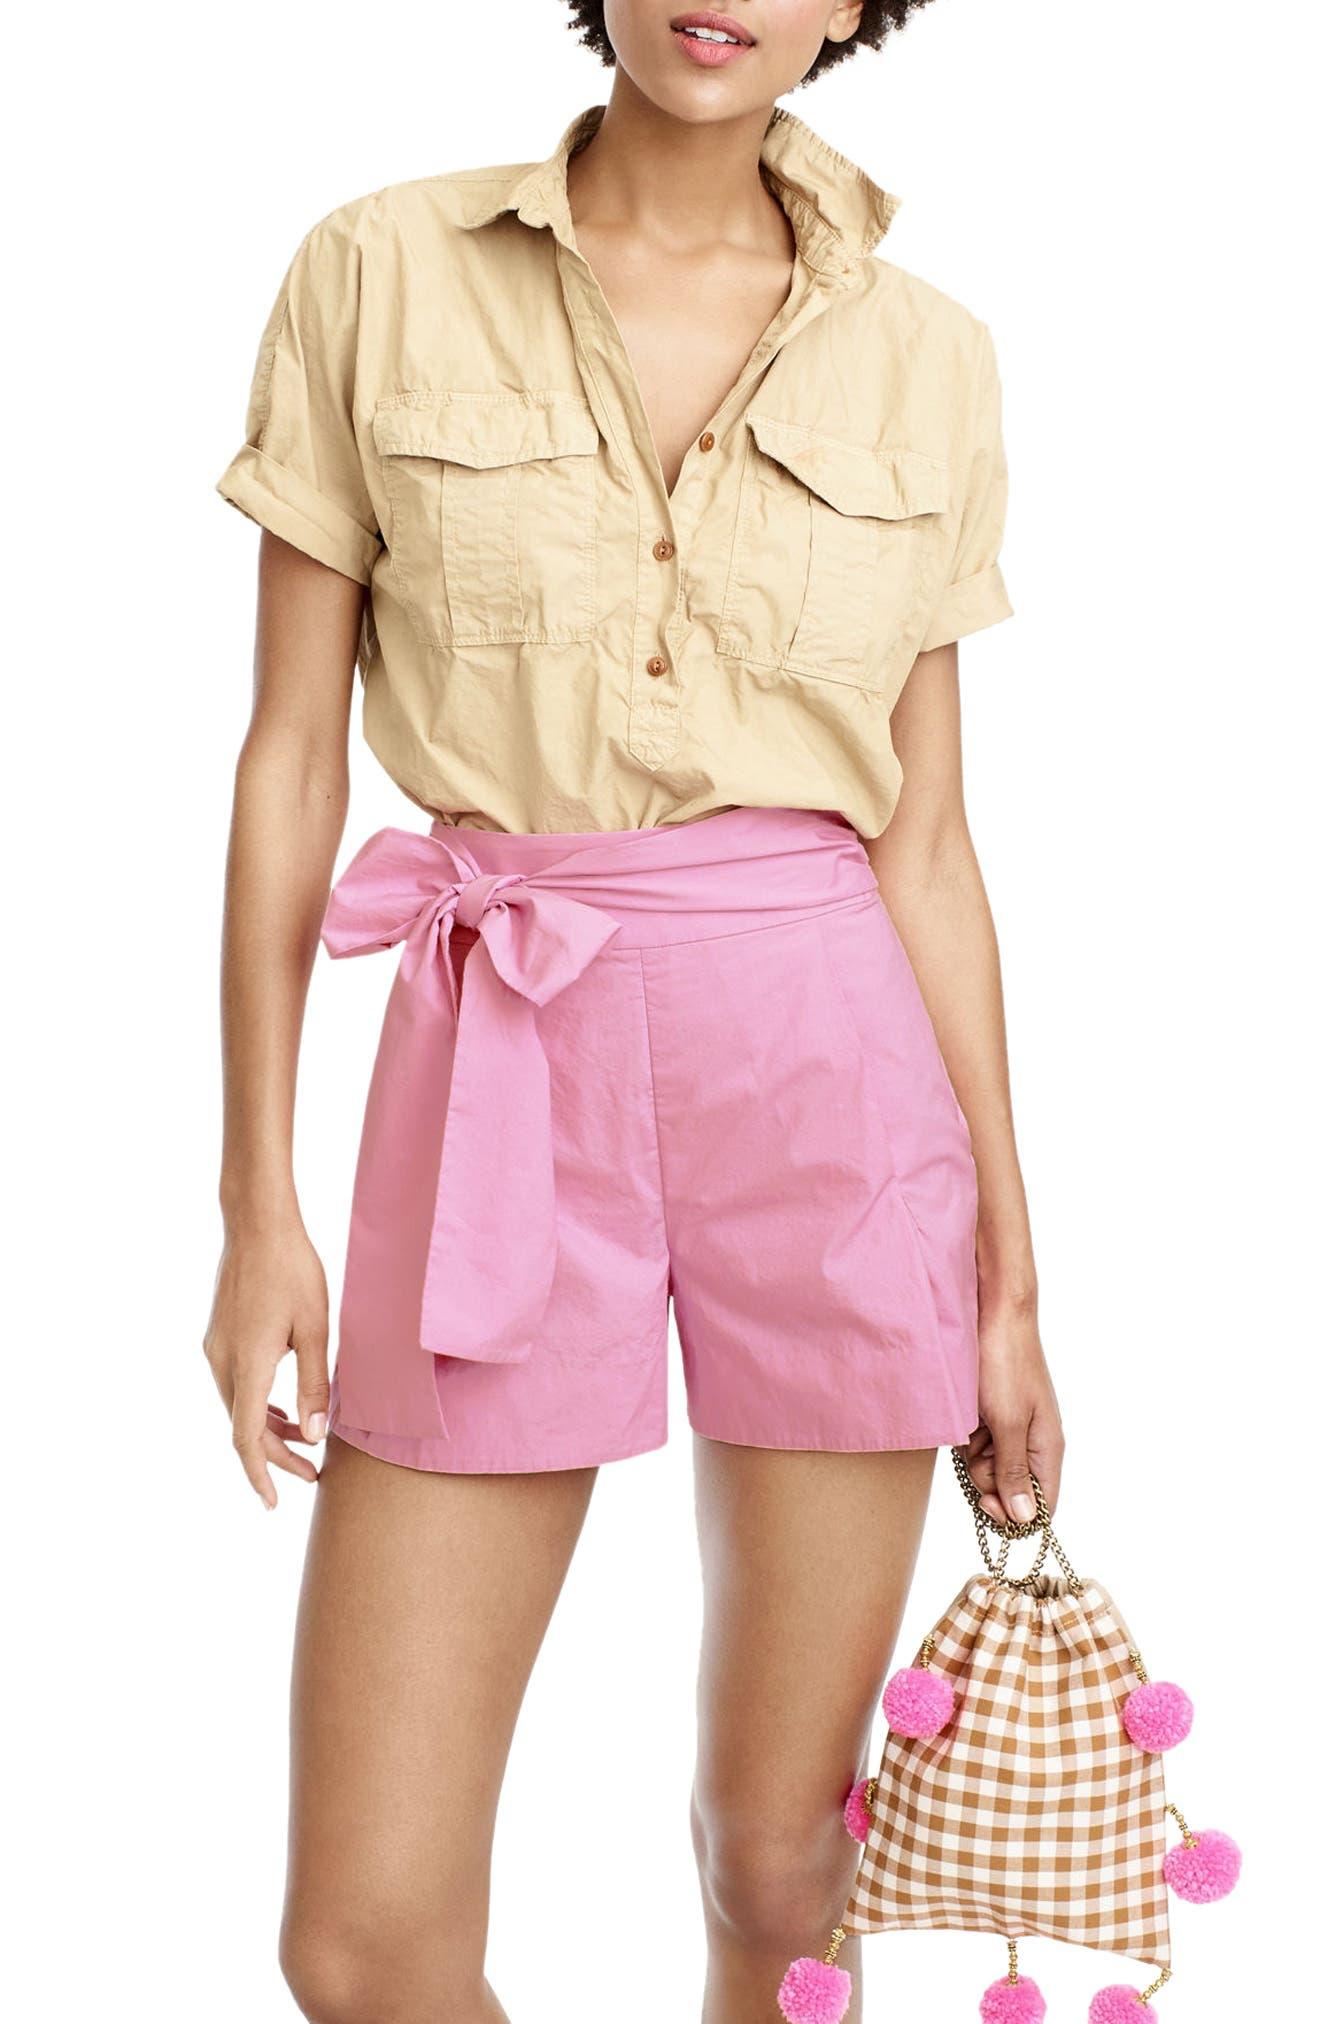 Alternate Image 1 Selected - J.Crew Cotton Poplin Tie Waist Shorts